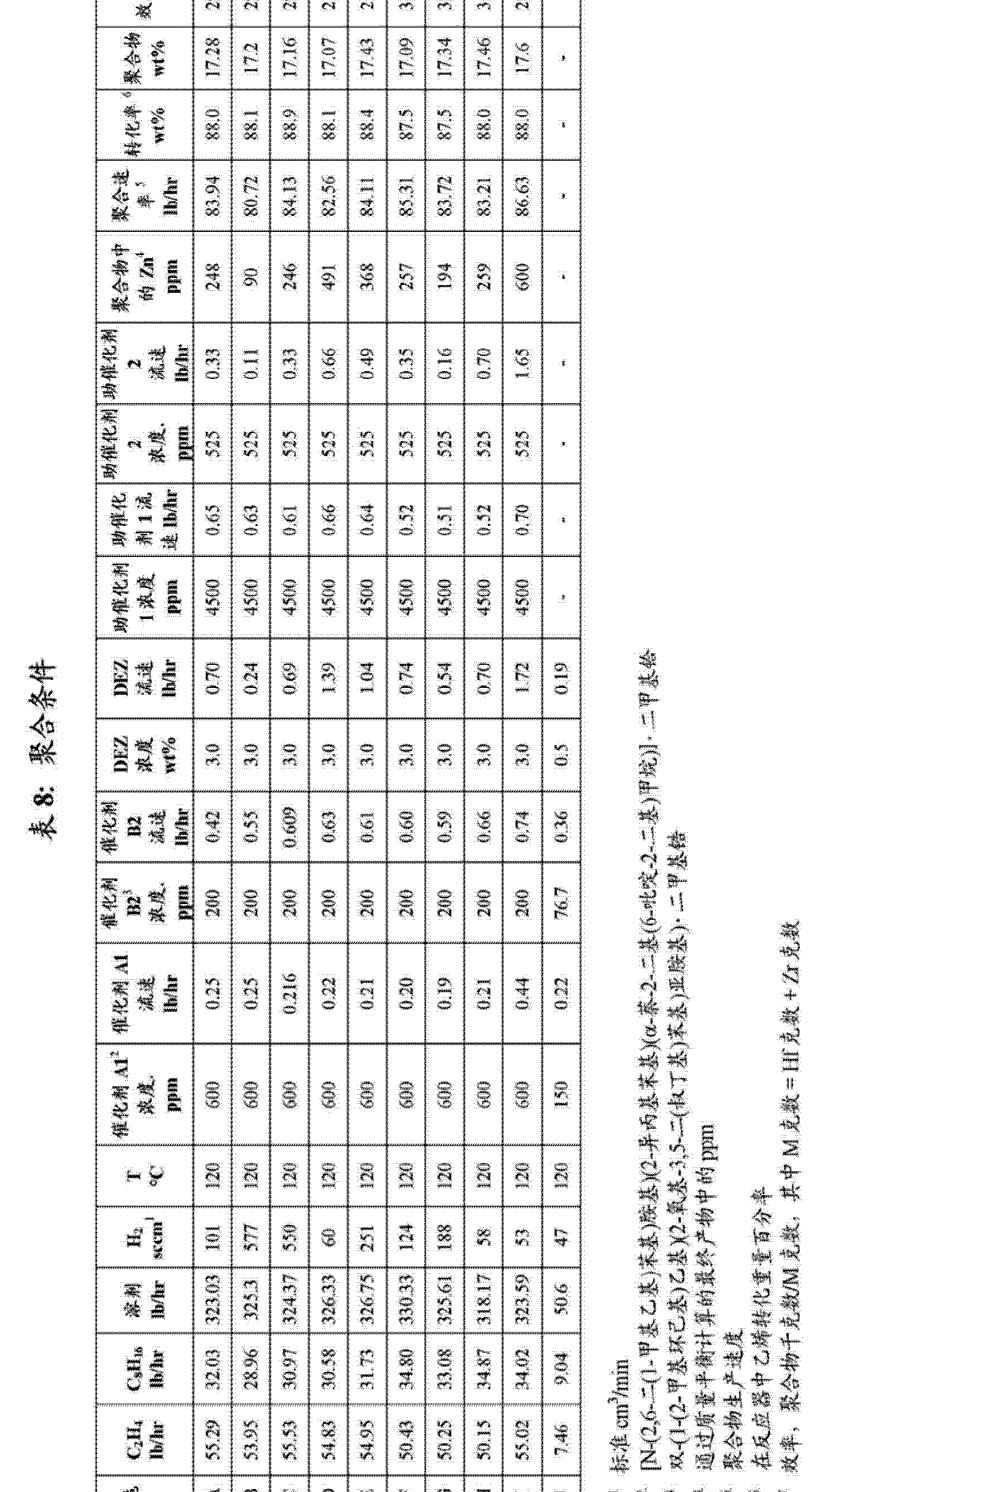 medium resolution of wiring diagram of motorcycle honda tmx 155 best wiring diagram wiring diagram of honda tmx 155 contact point